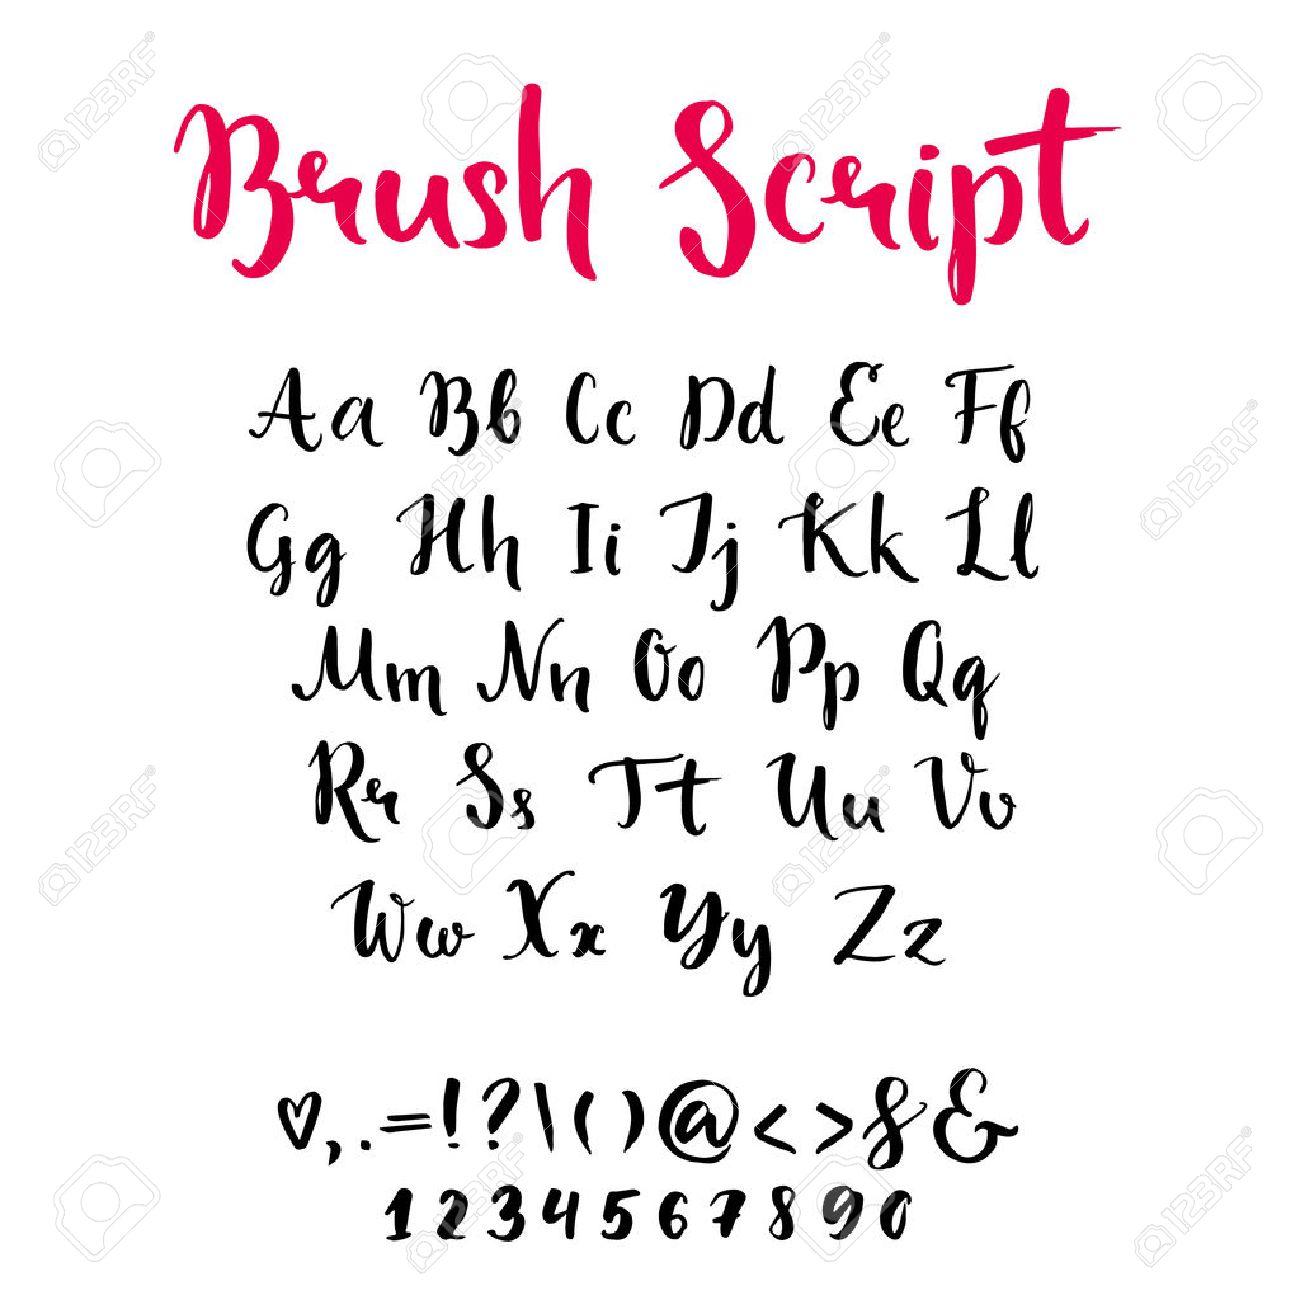 Brush Script With Lowercase And Uppercase Letters Keystrokes Digits Full Alphabet Handwritten